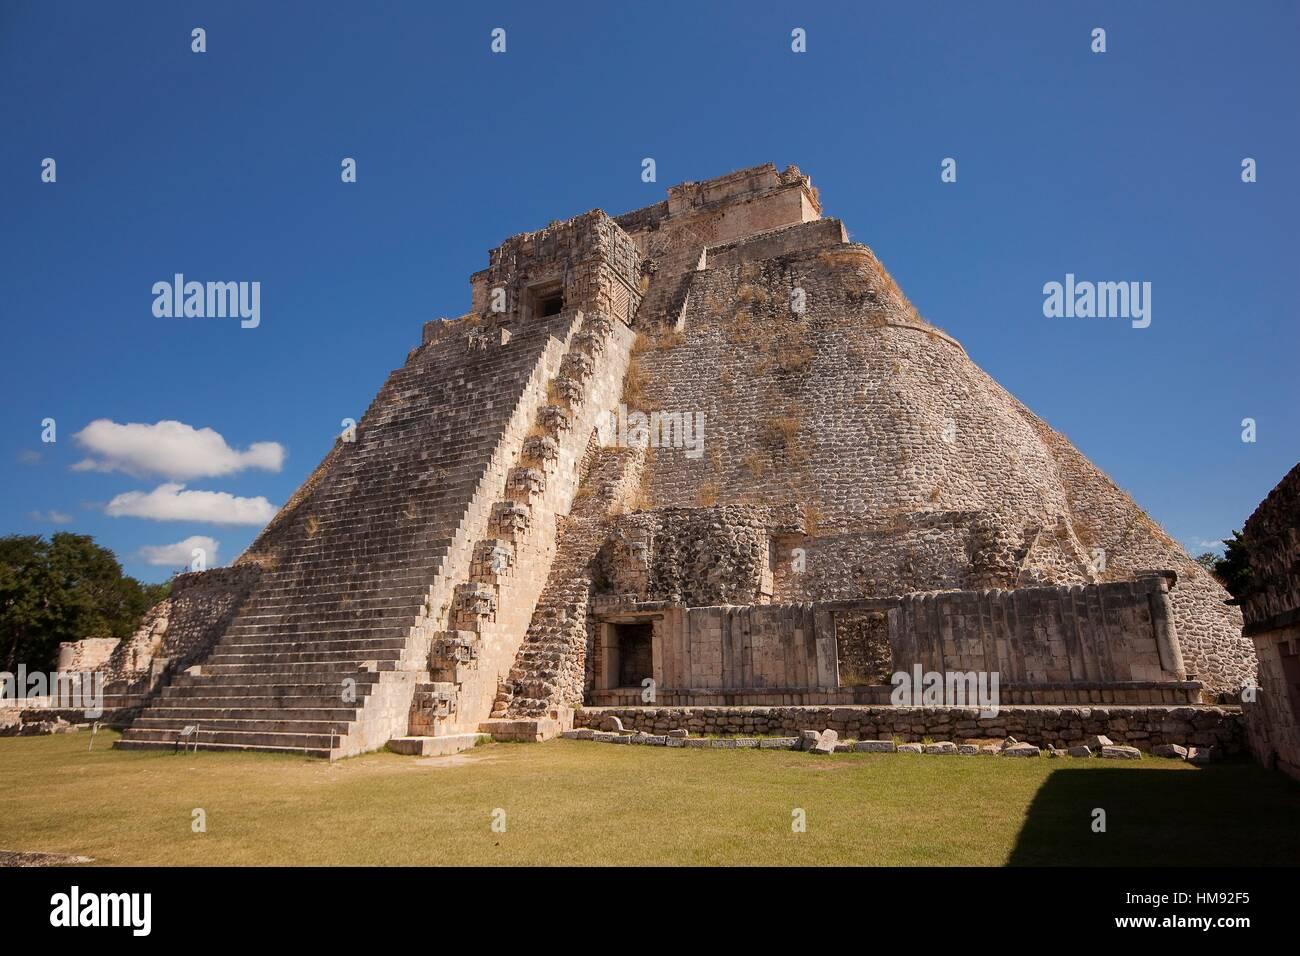 Pyramid of the Magician, Maya archeological site Uxmal, Yucatan, Mexico, Central America. - Stock Image